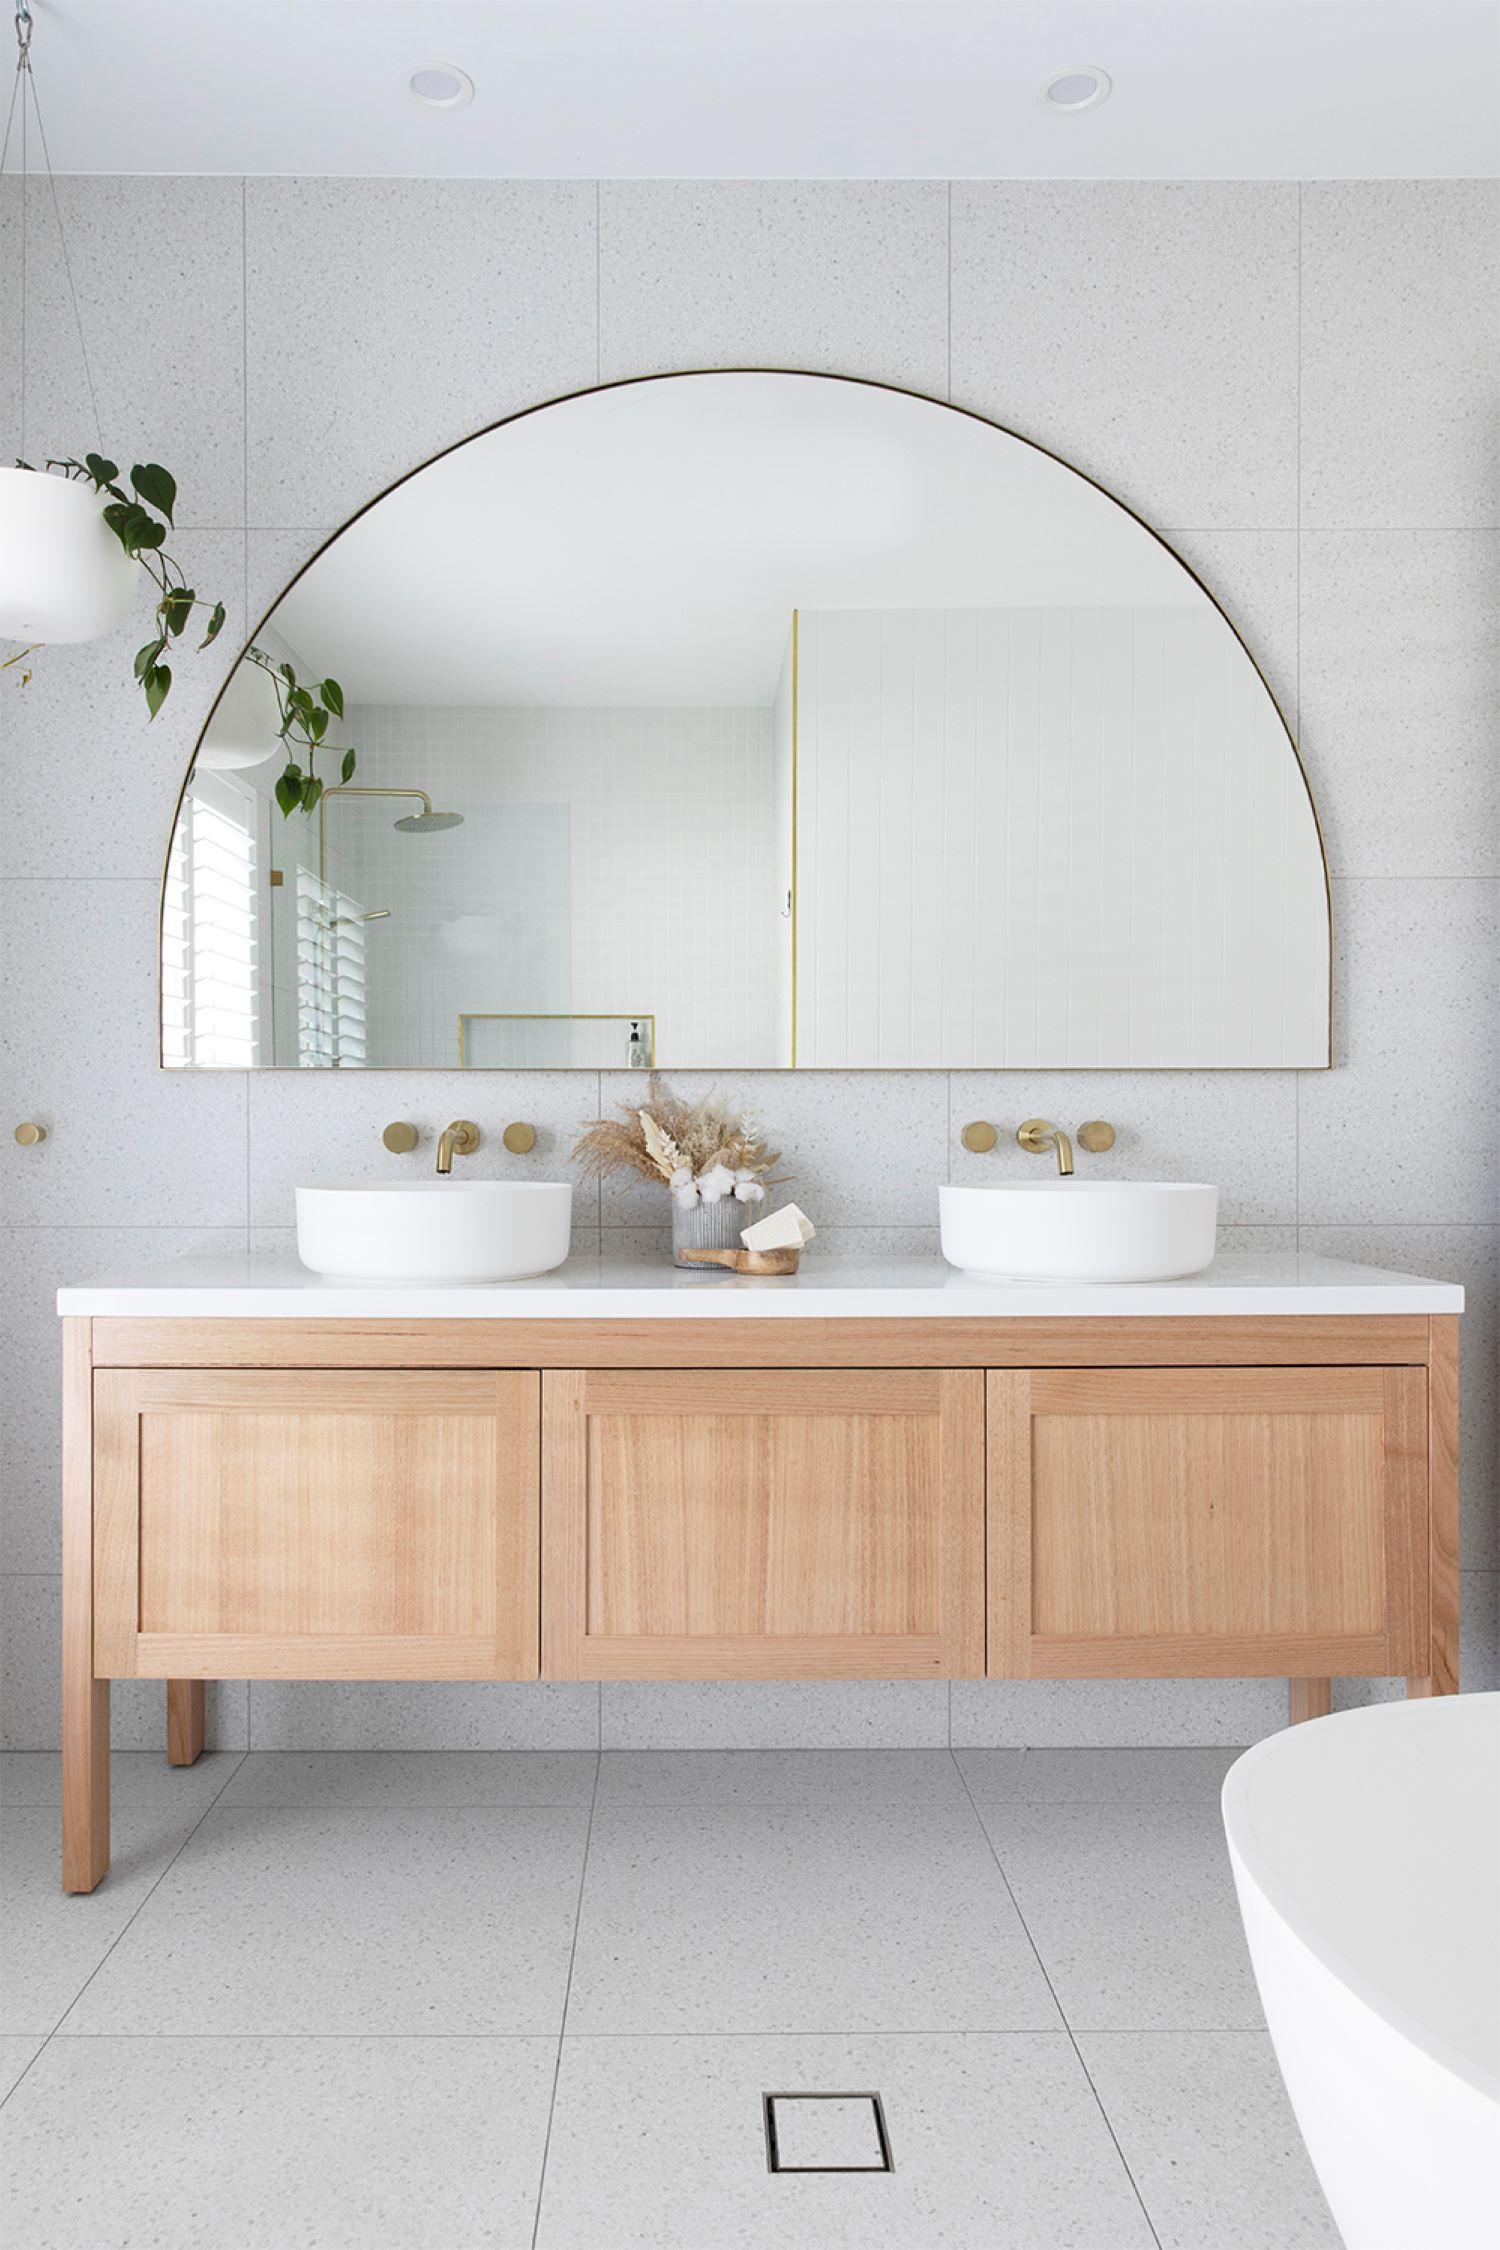 the-coastal-barn-dream-home-arched-bathroom-mirror